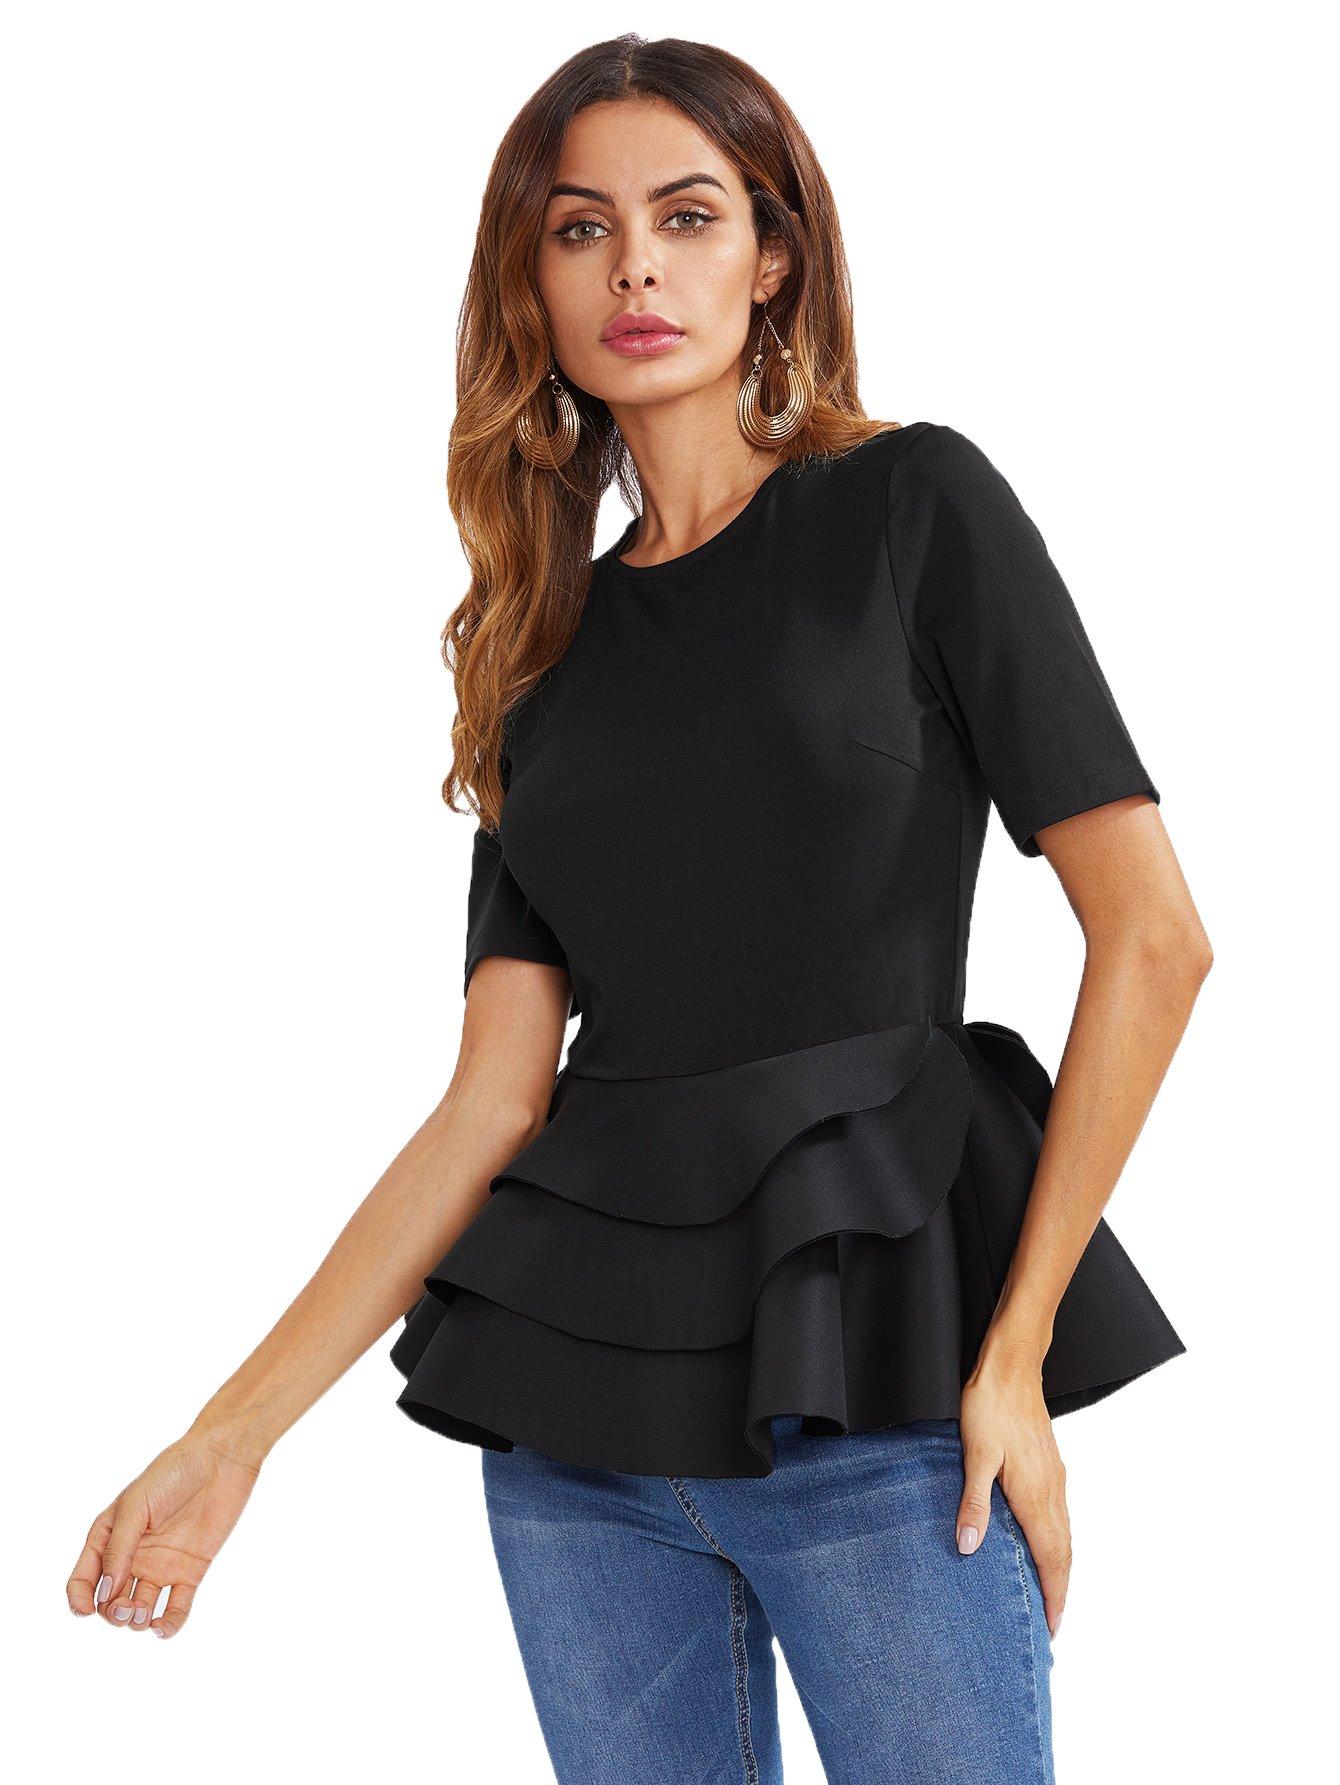 Romwe Women's Vintage Layered Ruffle Hem Slim Fit Round Neck Peplum Blouse Black XL